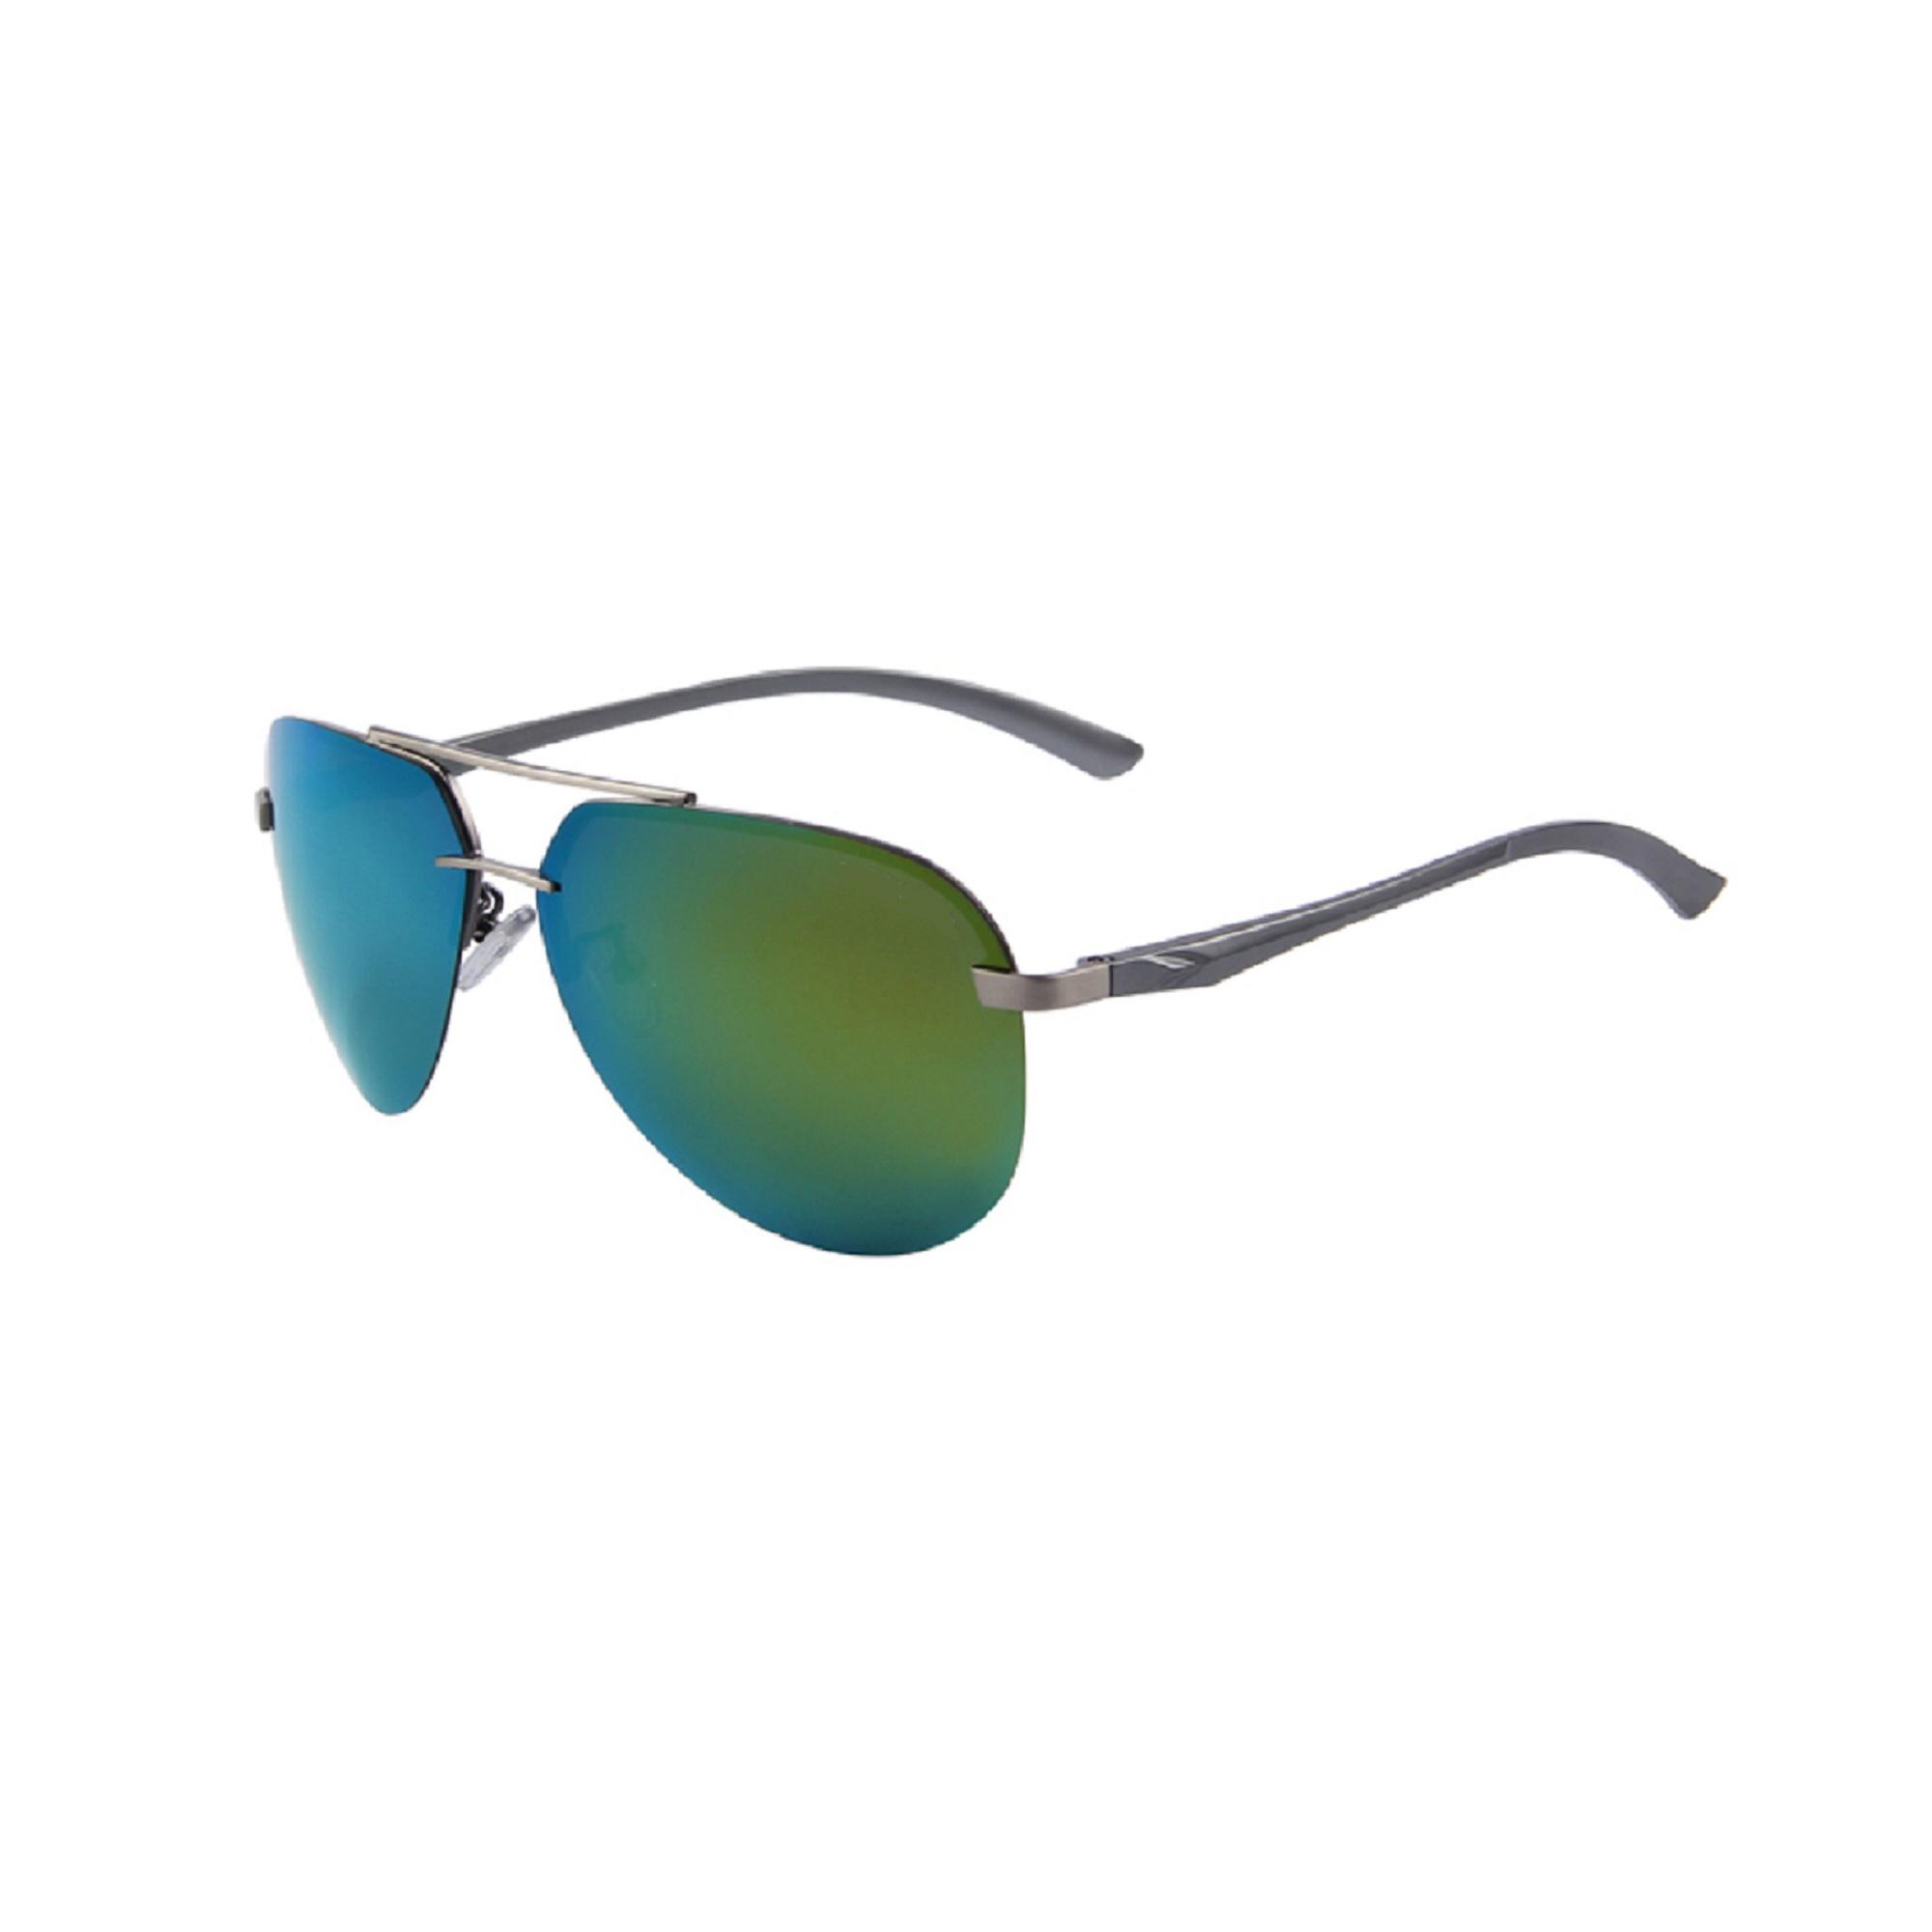 Premium Gold Mirror Polarized Aviator Sunglasses